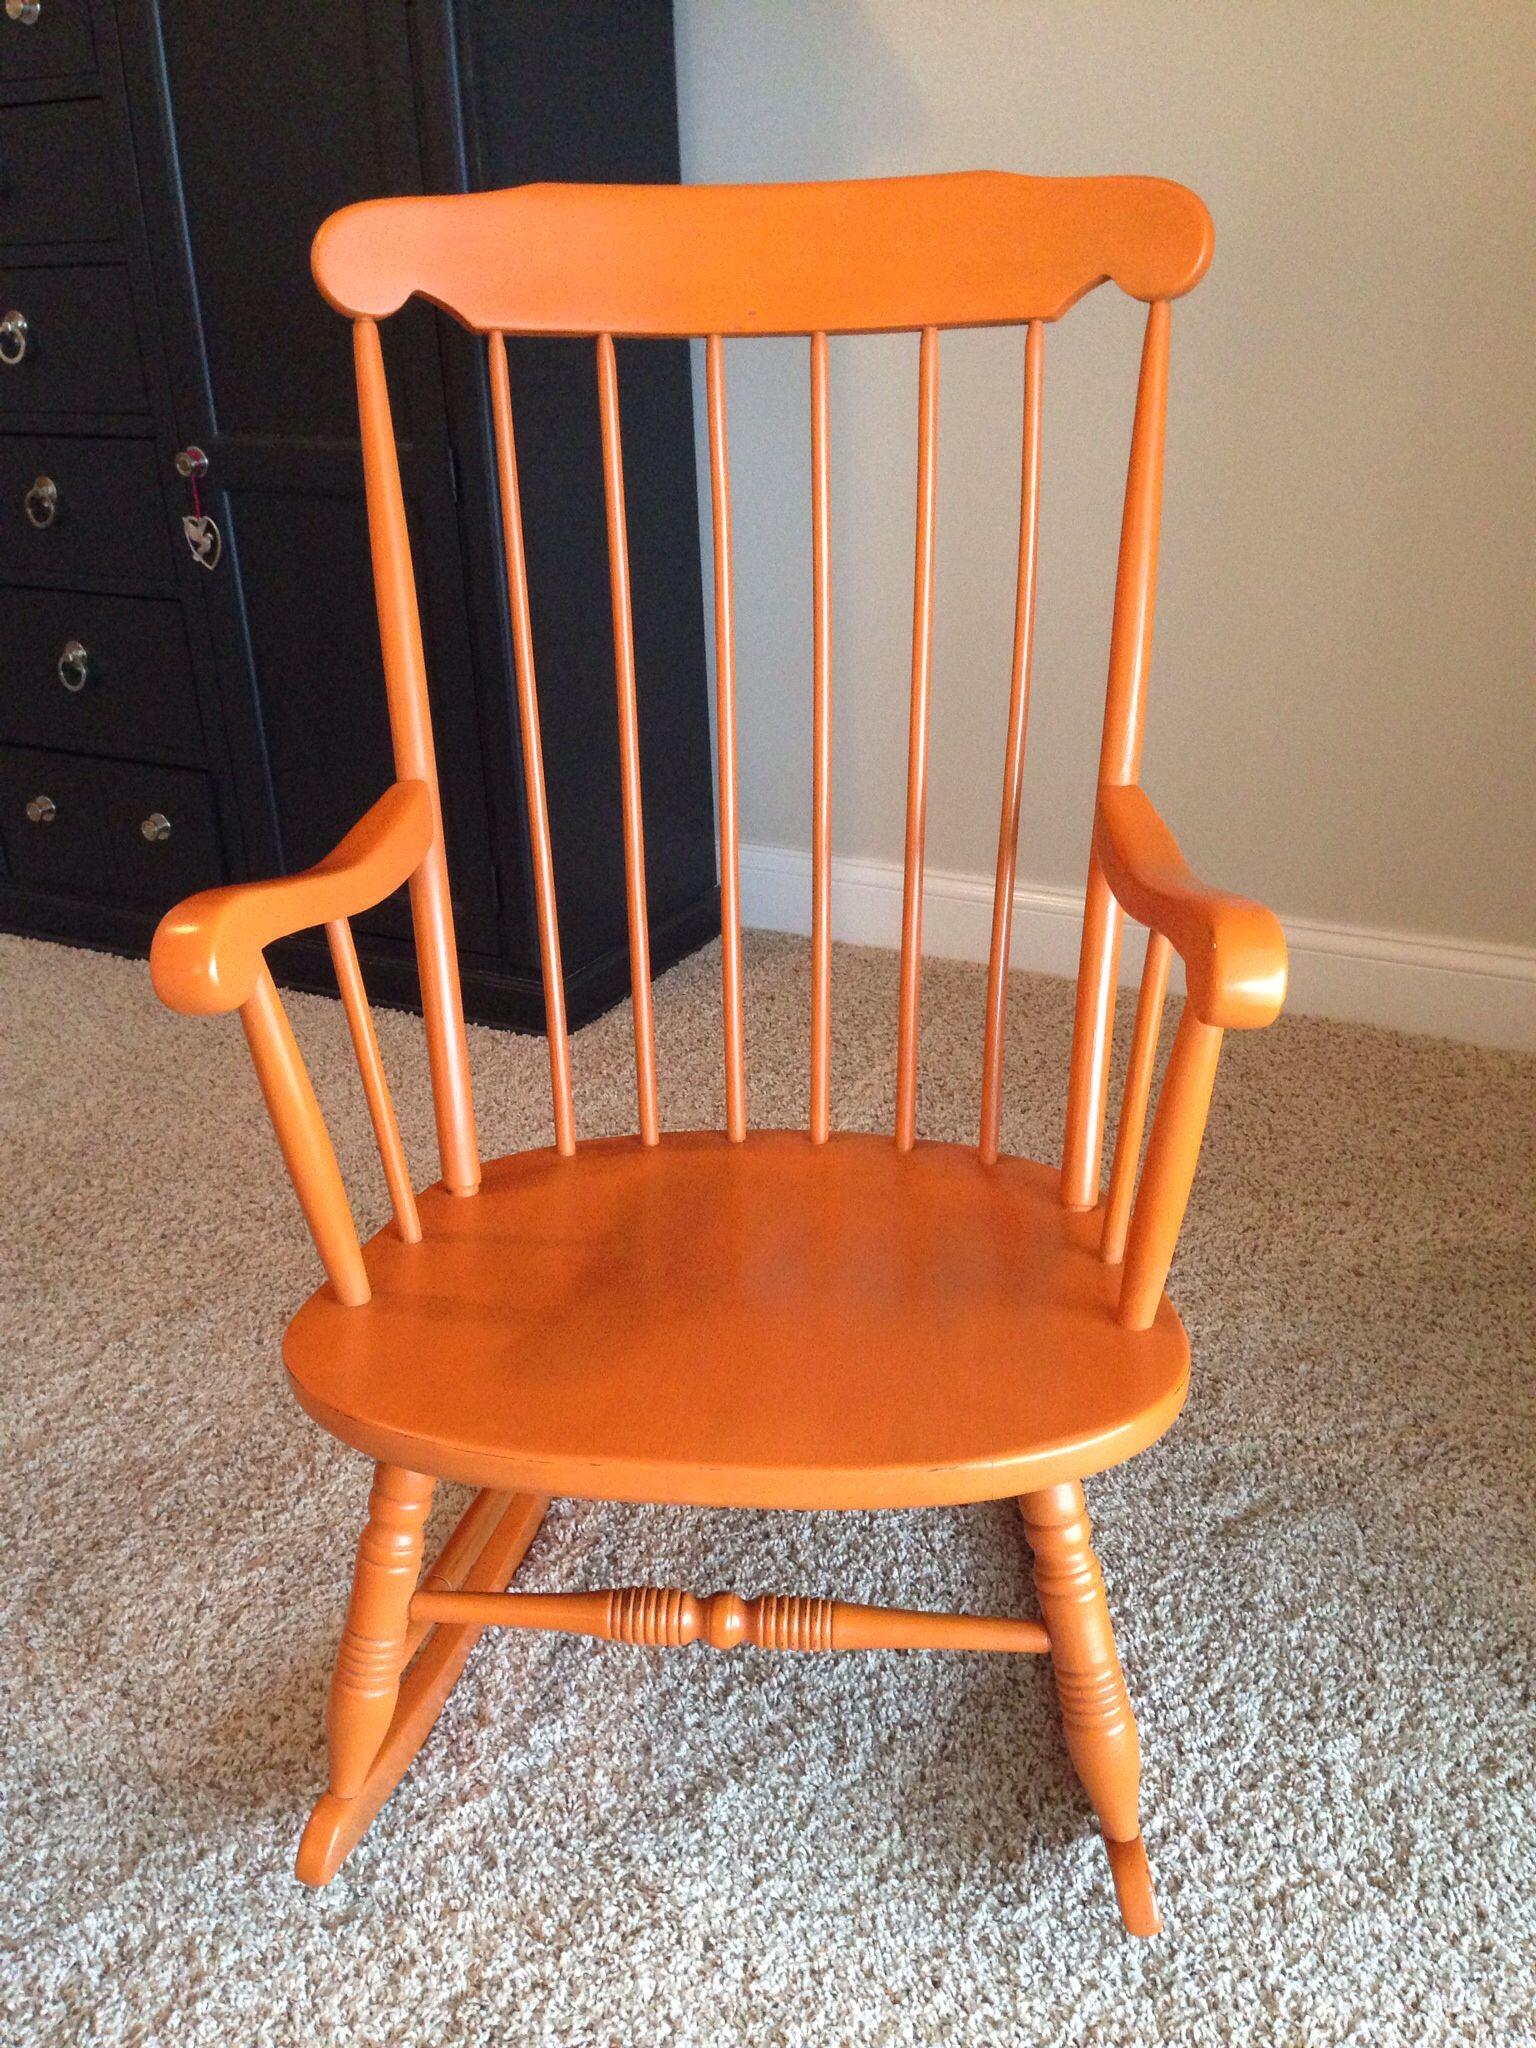 Annie Sloan Barcelona Orange With Dark Wax Refurbished Furniture Real Milk Paint Company Diy Furniture